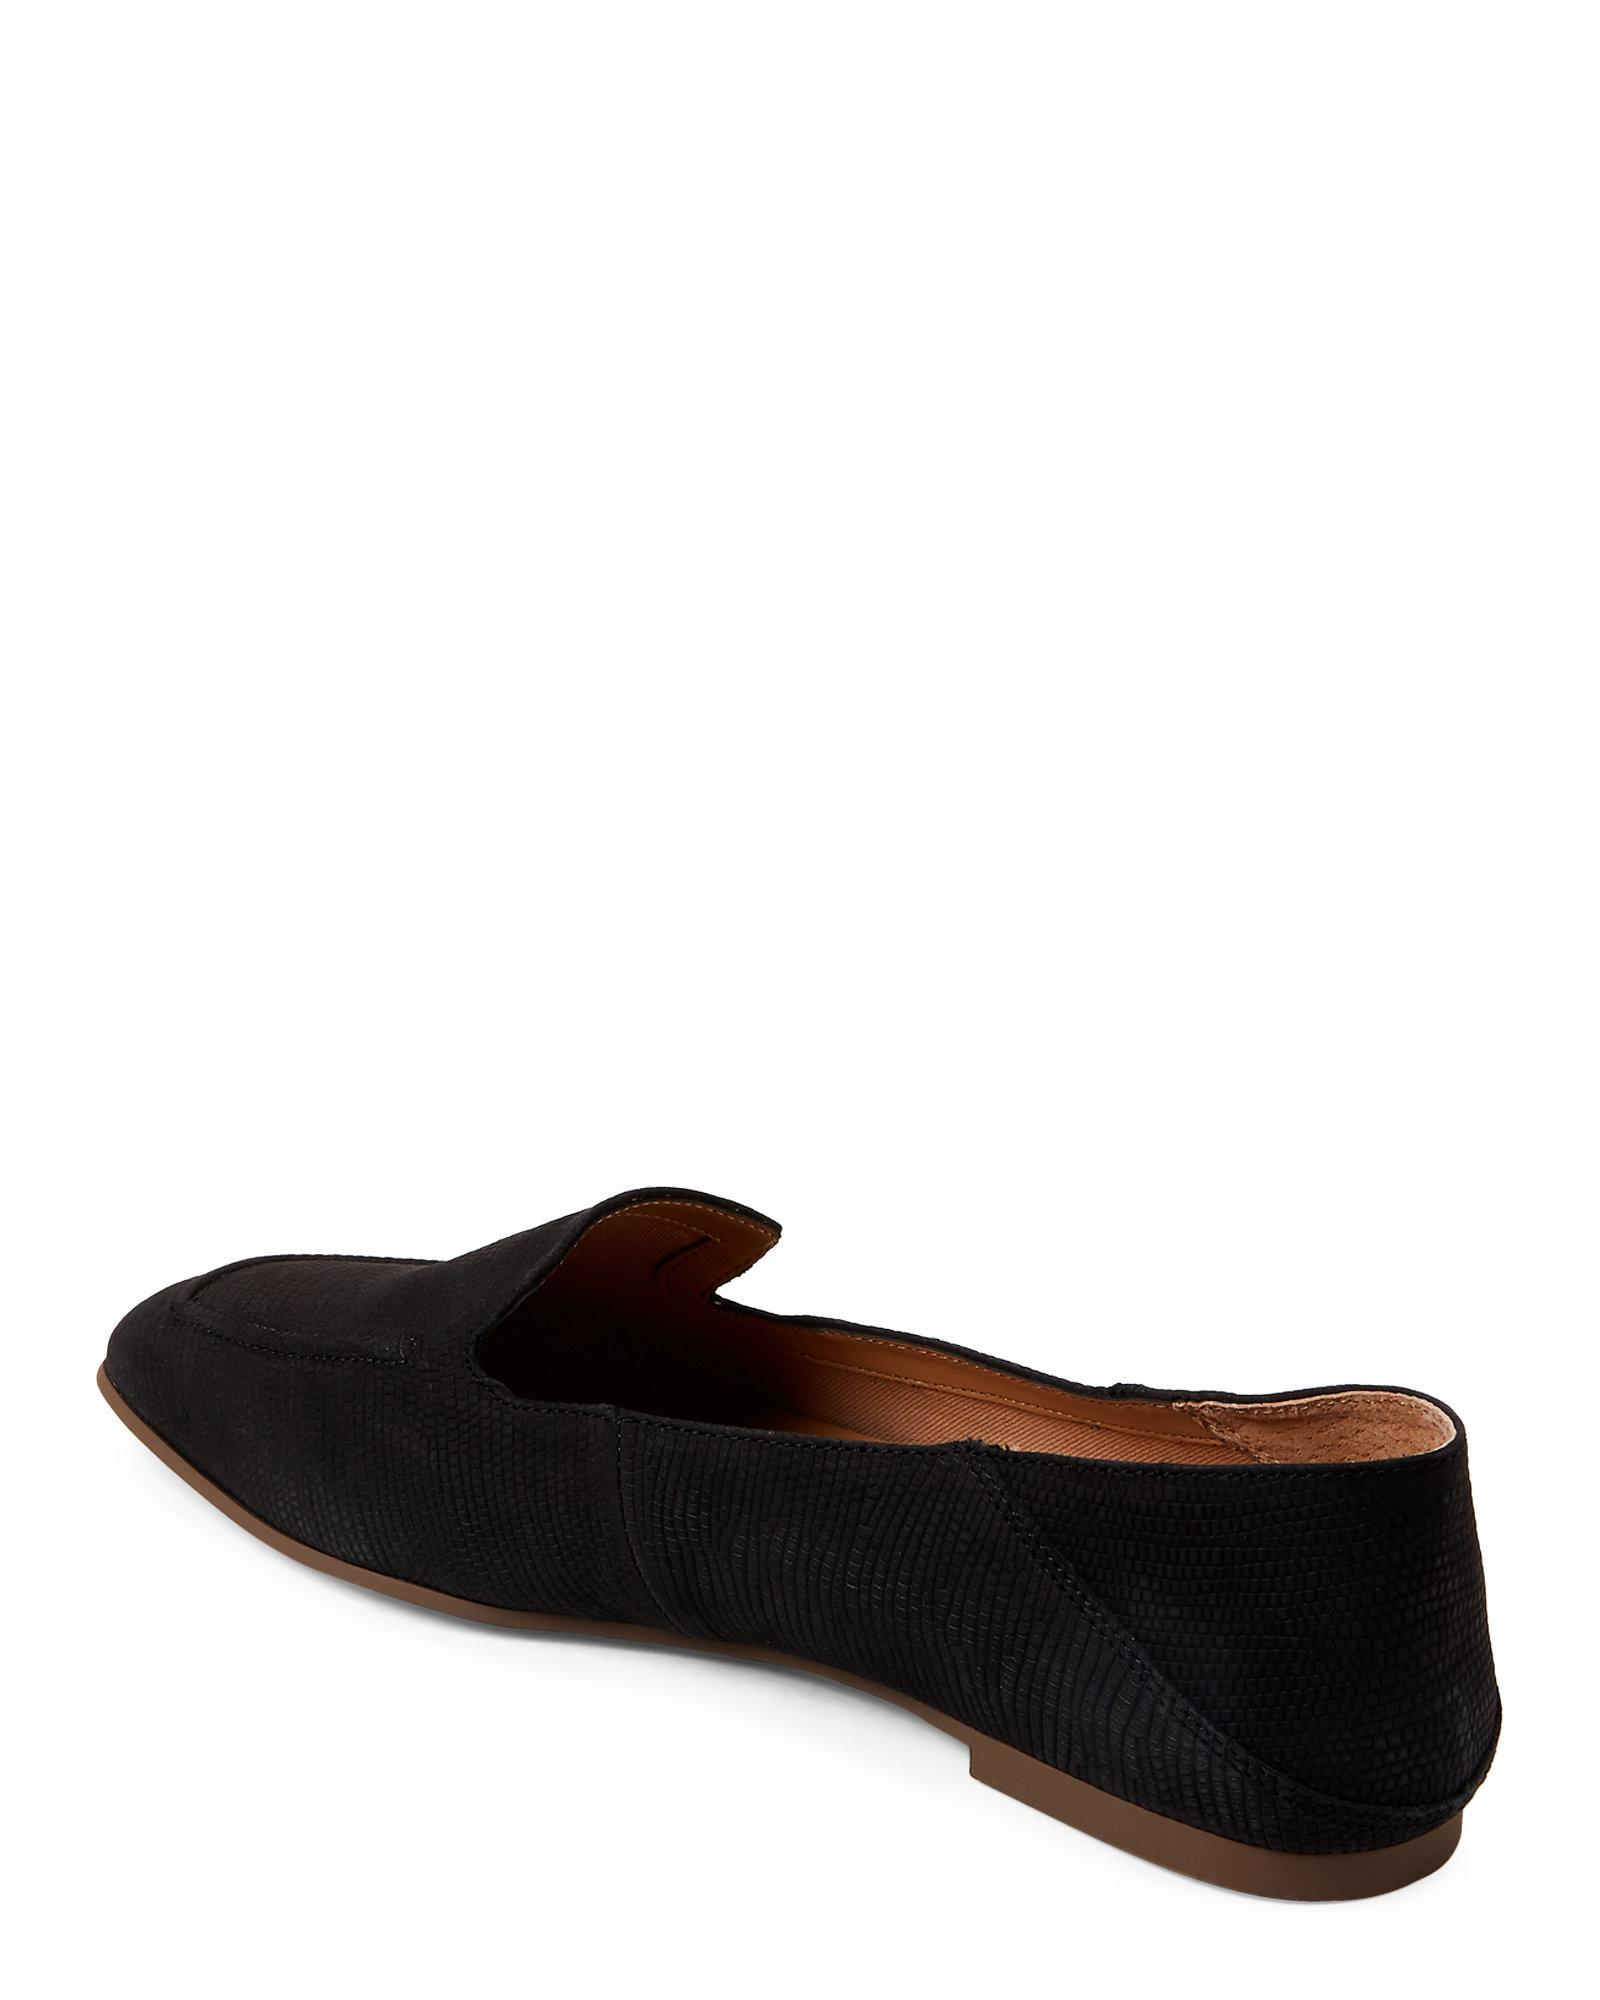 8920695afcc Lyst - Franco Sarto Black Gracie Lizard Loafers in Black